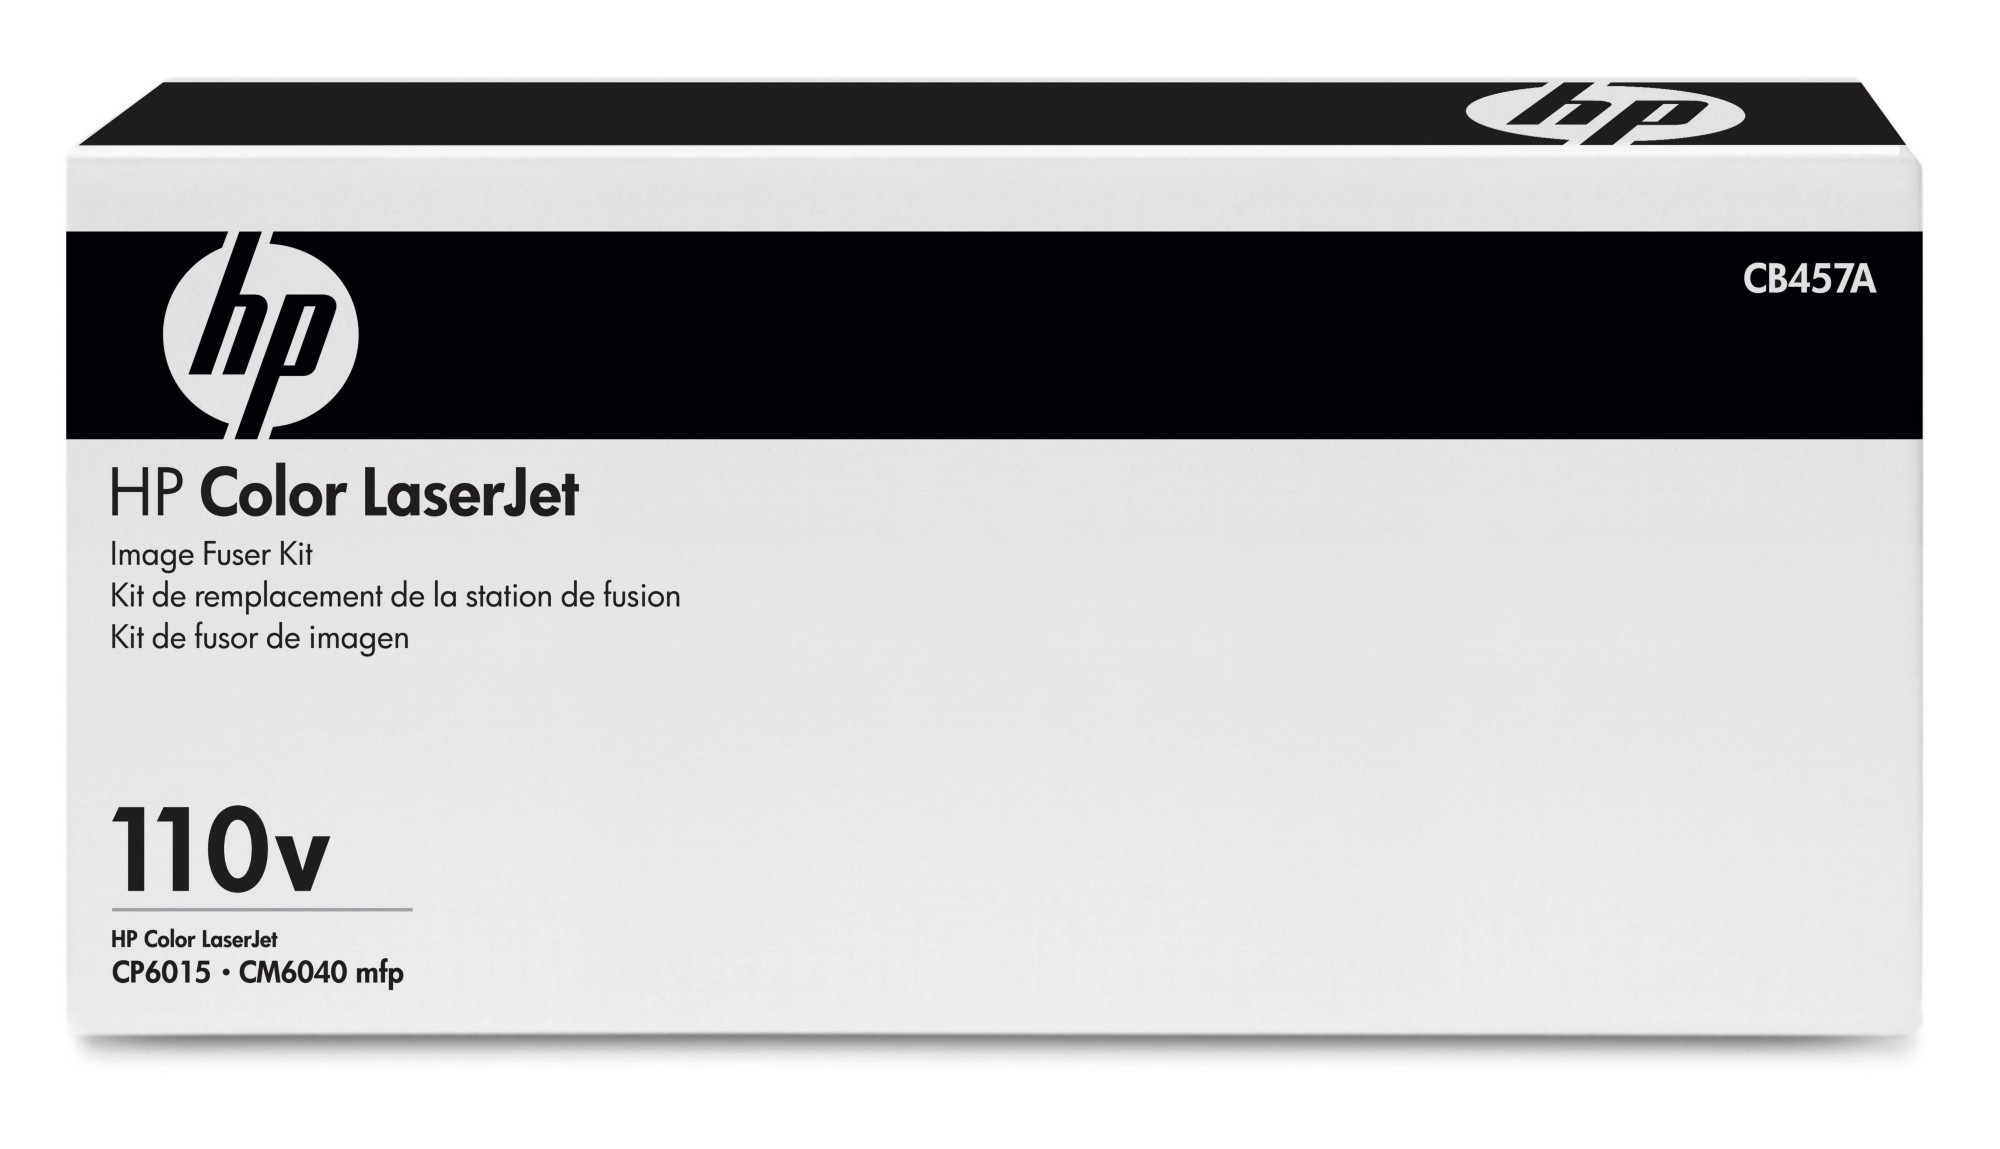 HP Color LaserJet CB457A 110V Fuser Kit